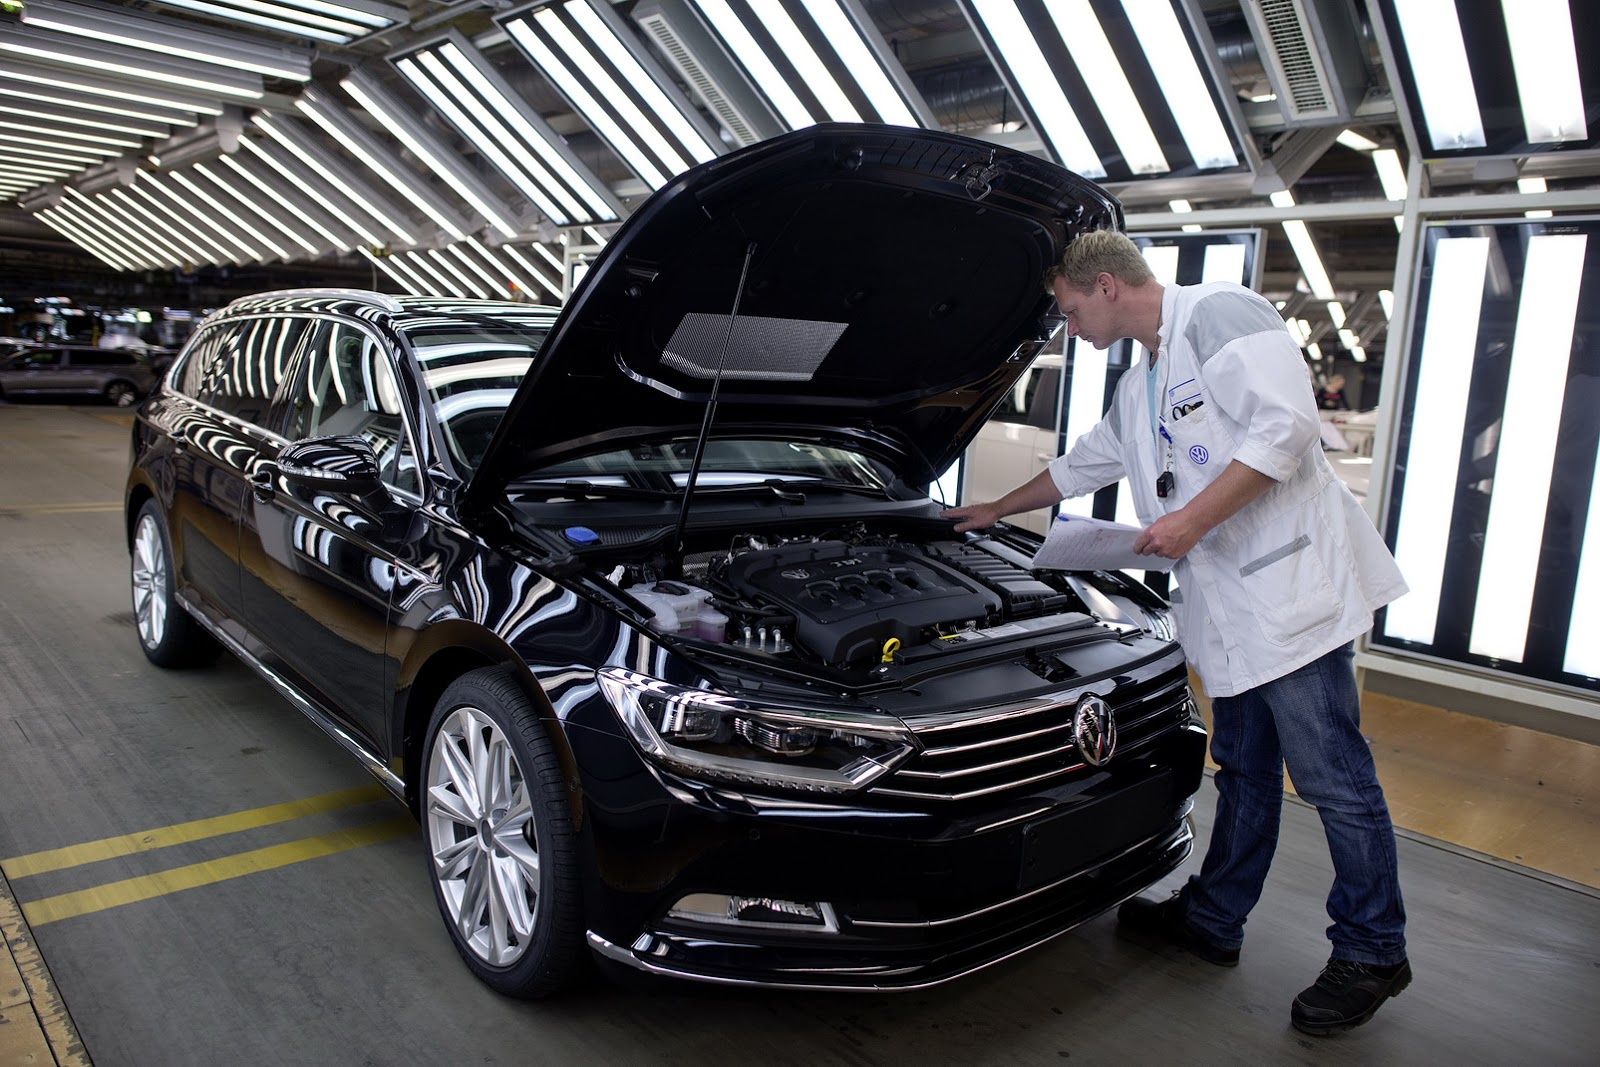 VW Confirms New Passat Alltrack for Next Year